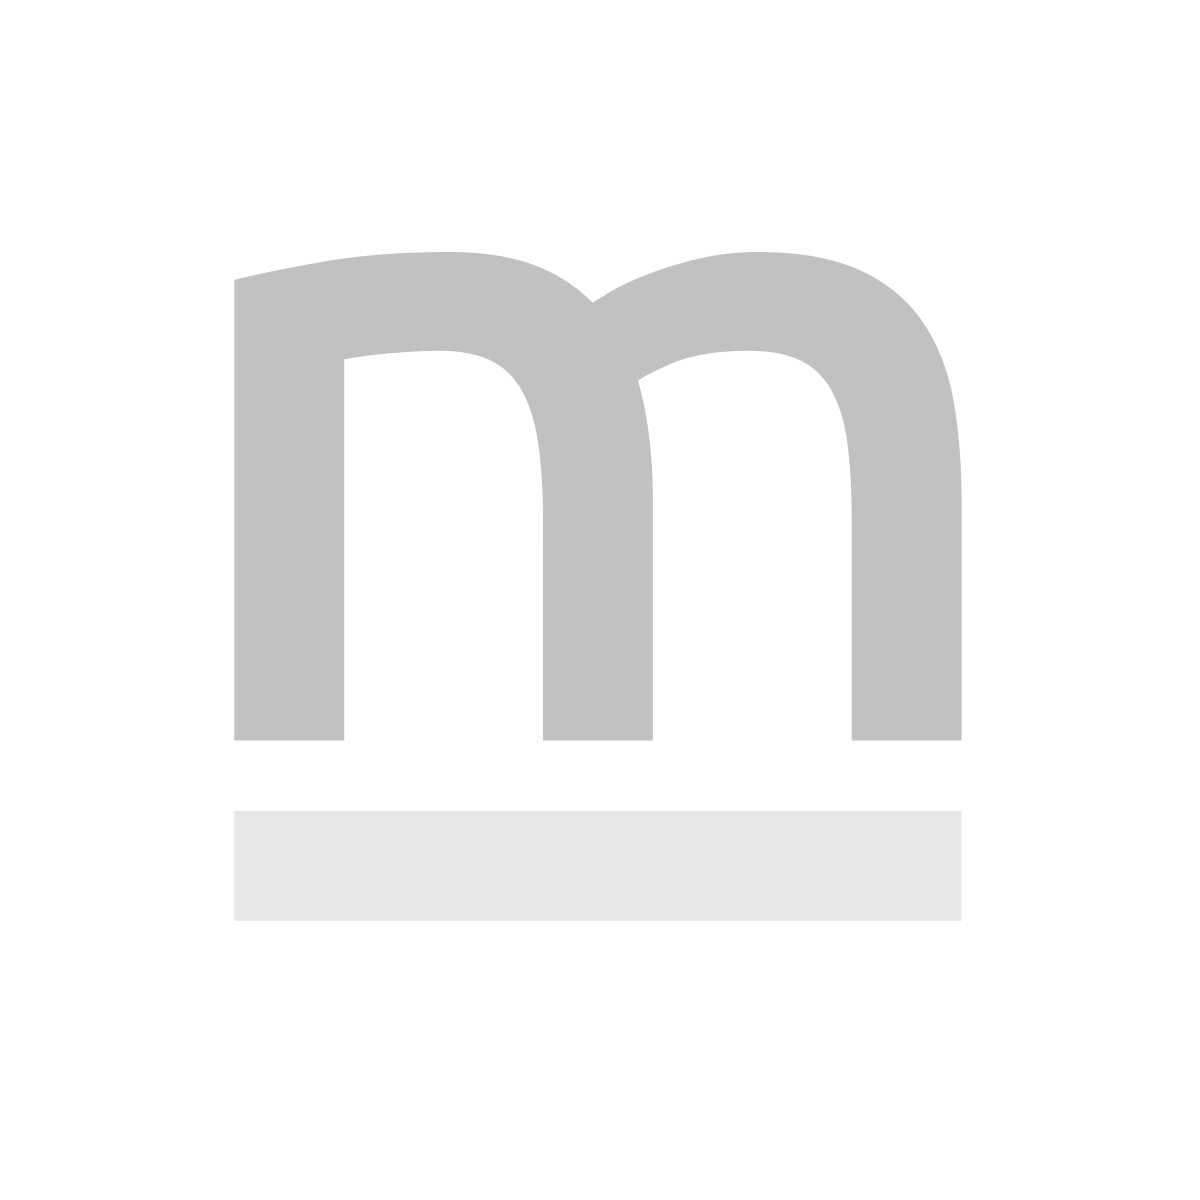 Krzesło CLAUDINE 1 VELVET granatowe